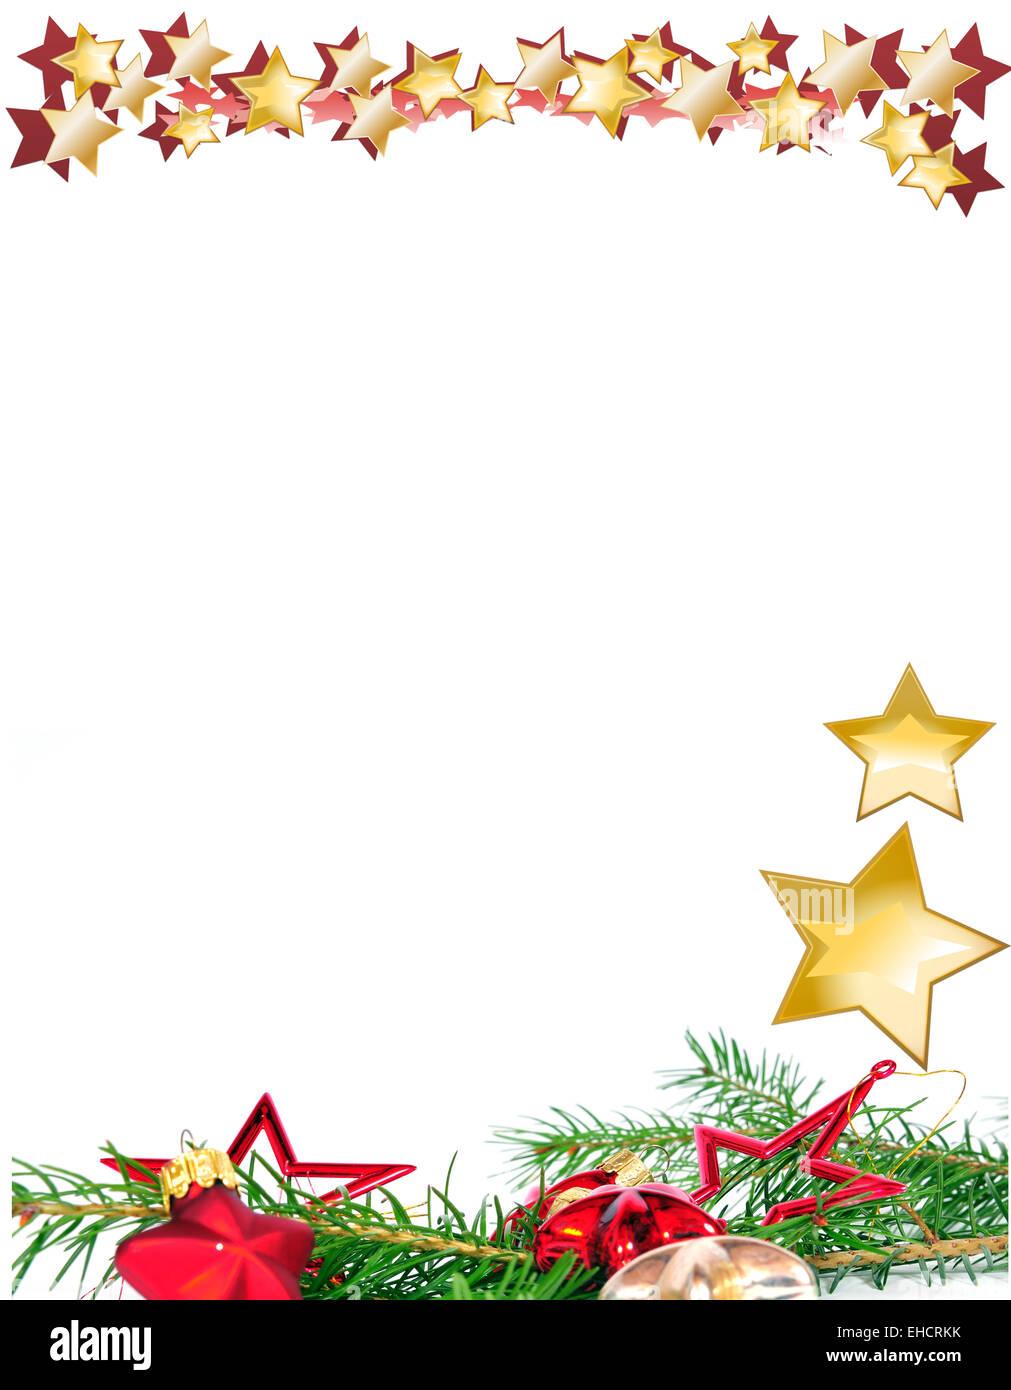 christmas stationery